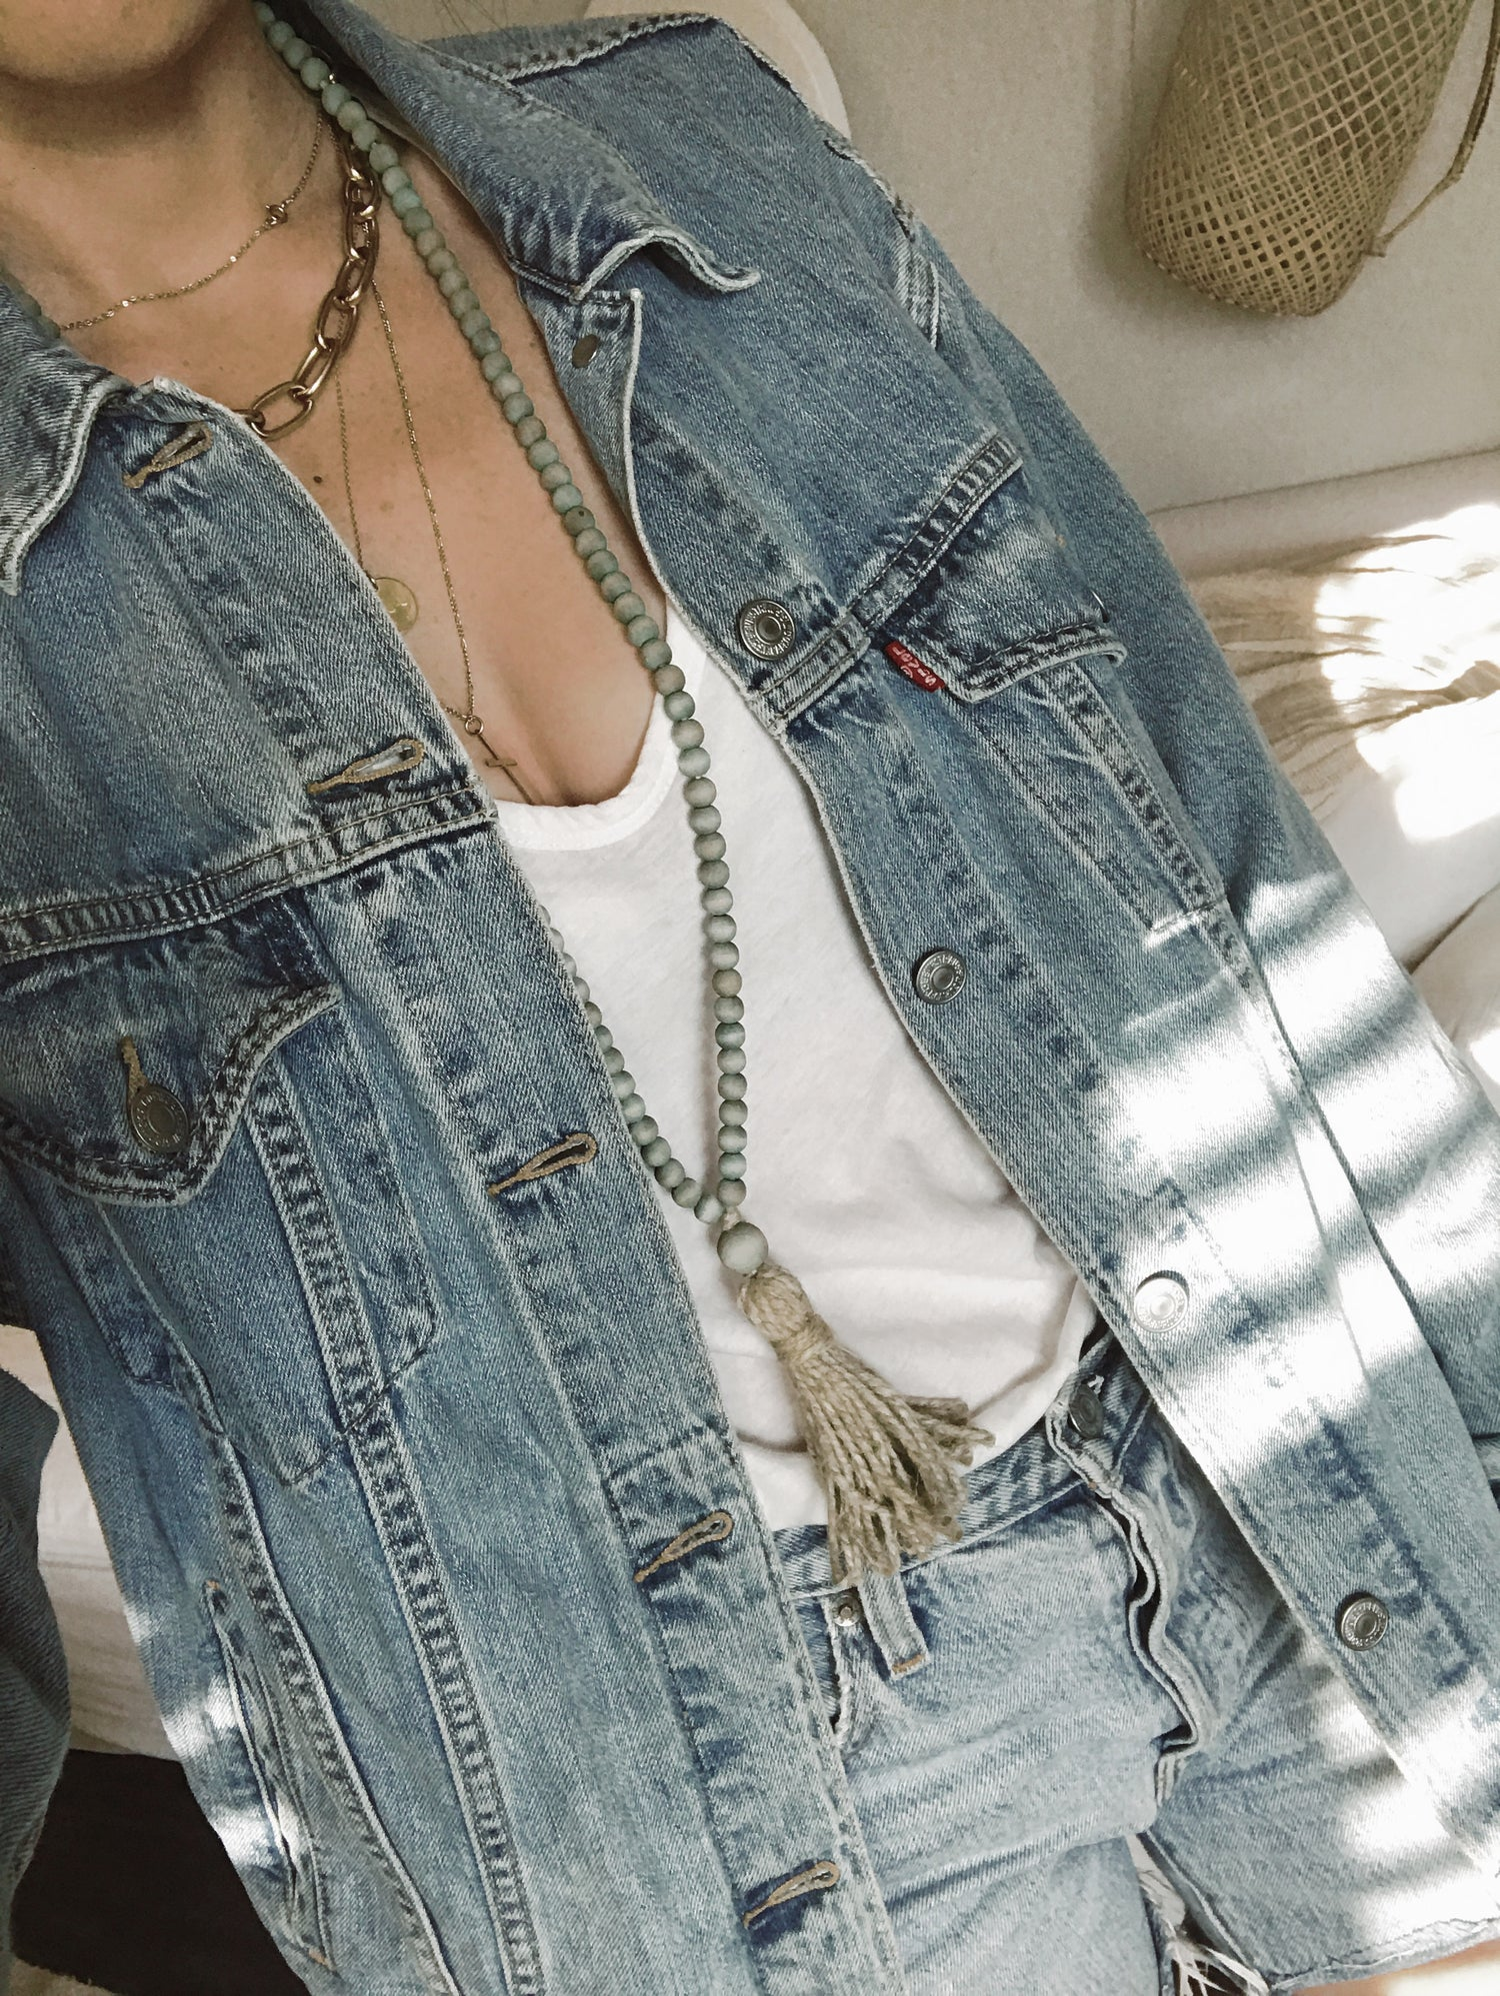 Image of Hemp Tassel Love Bead Necklace - Faded Denim